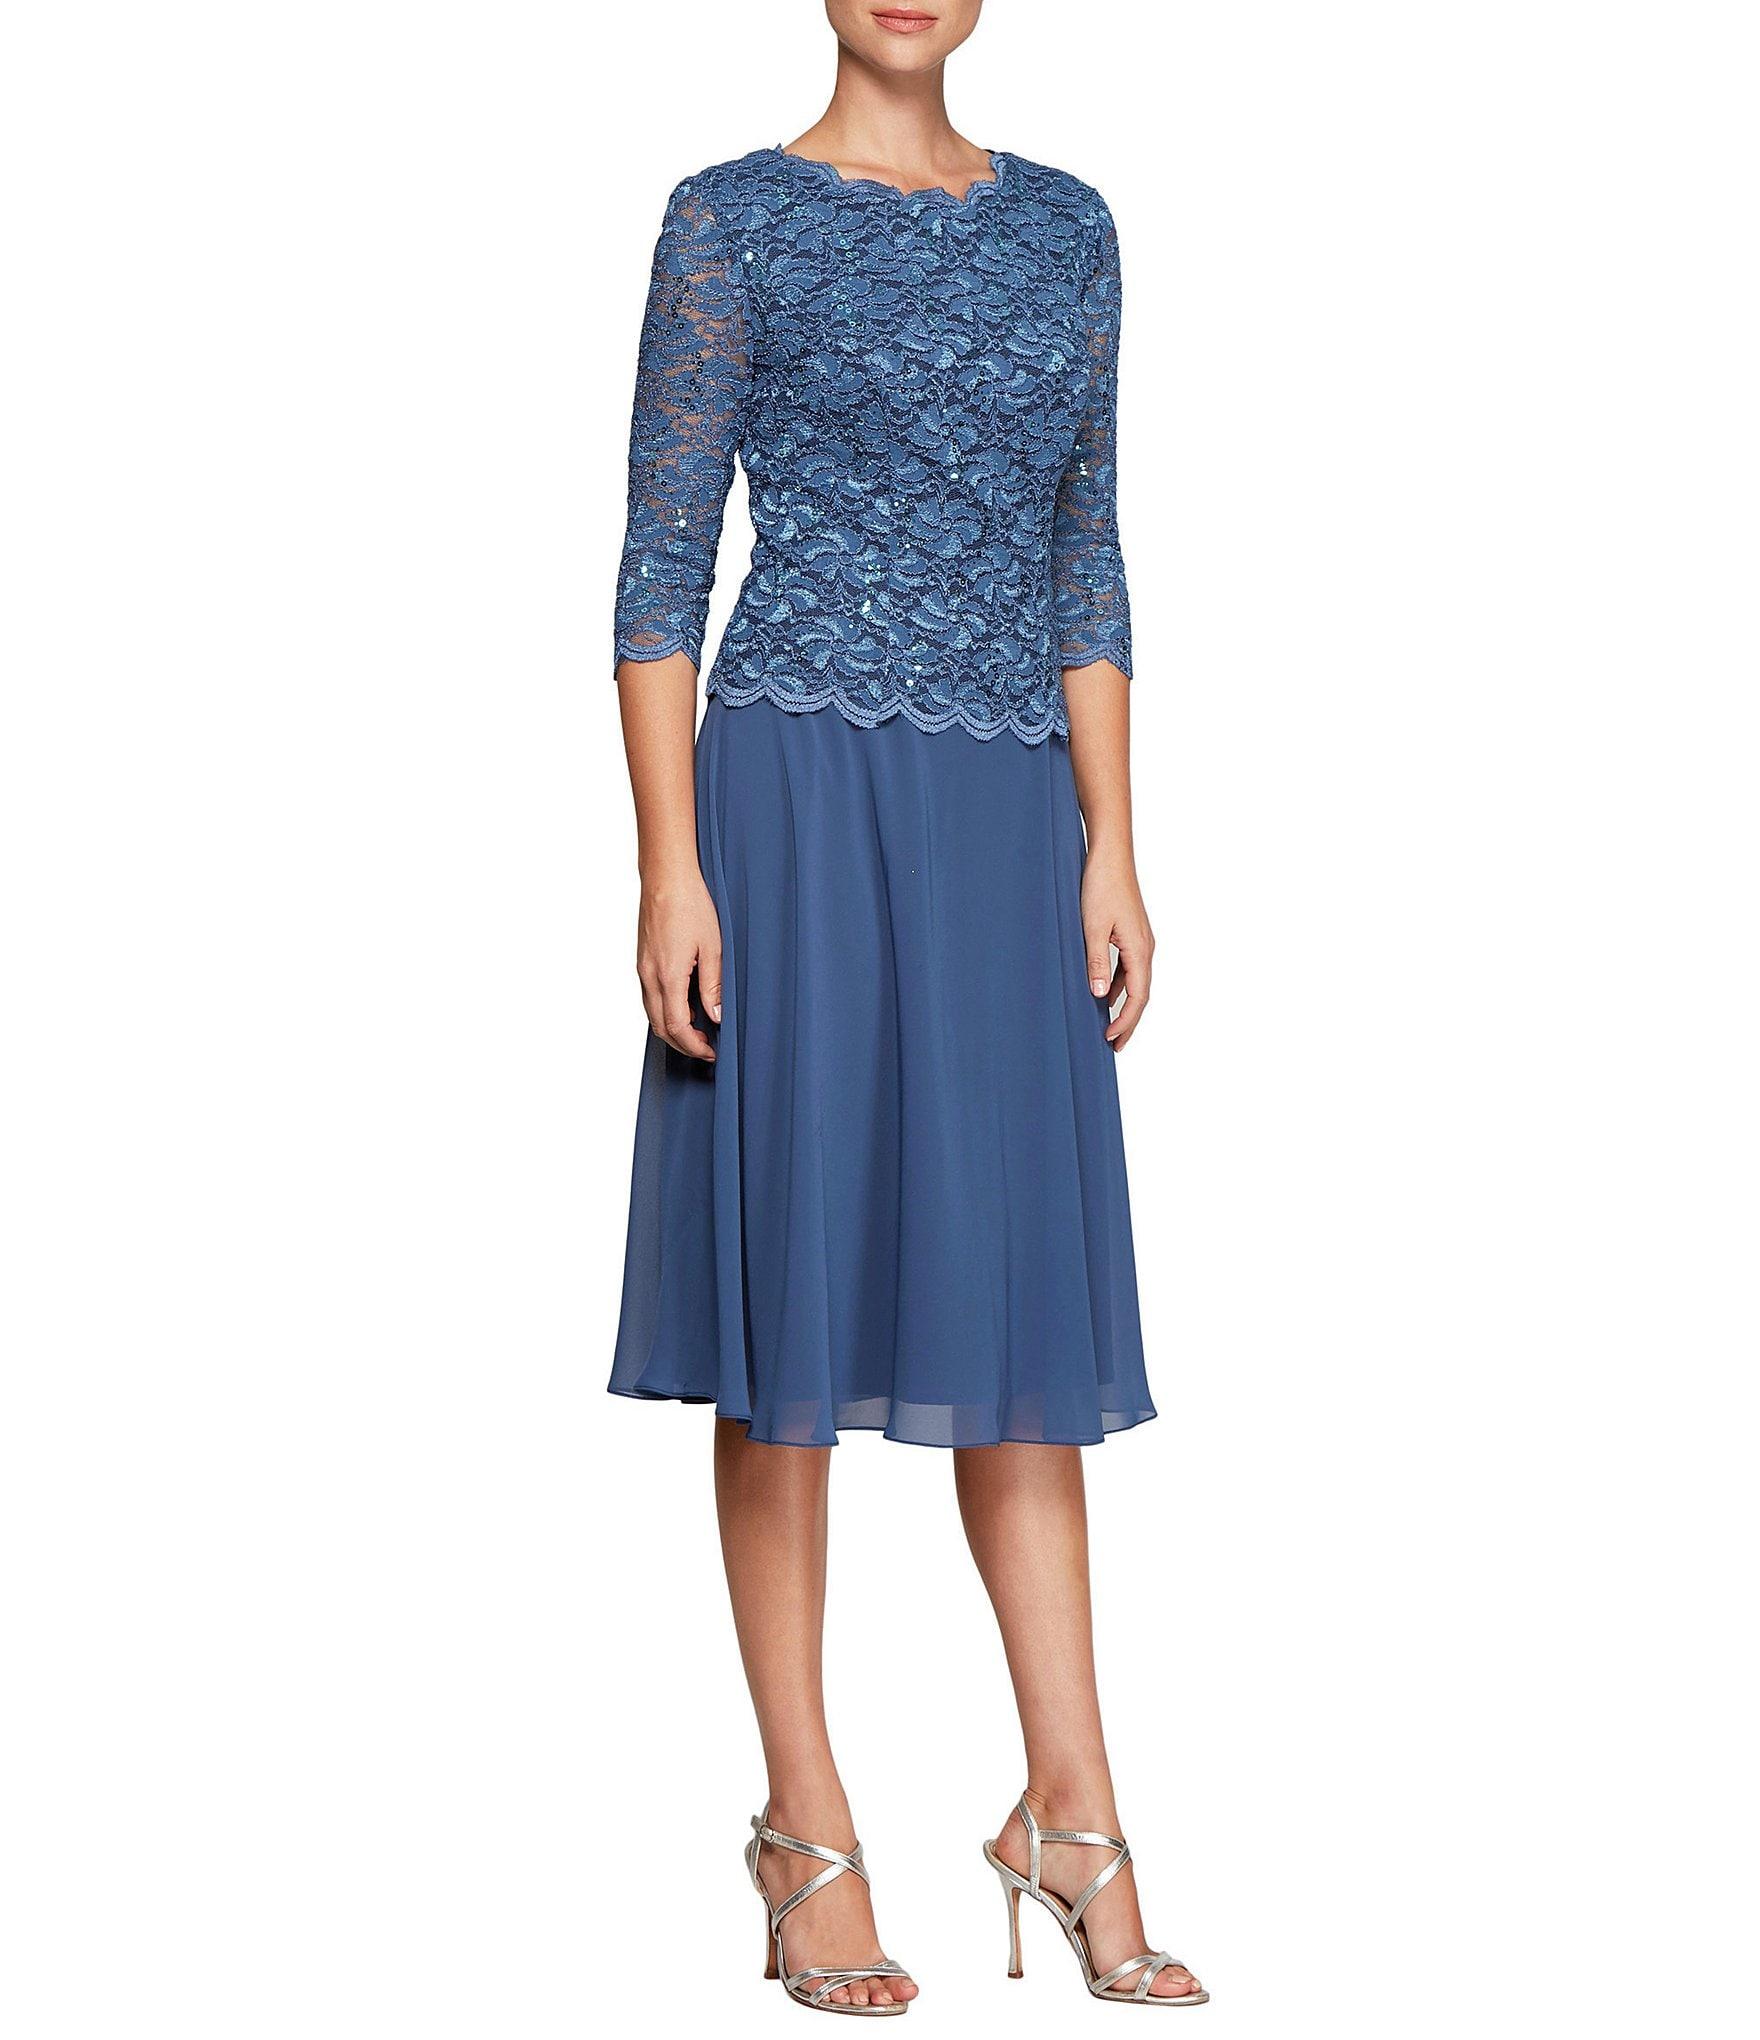 Dillard S Wedding Registry: Alex Evenings Petite Mock 2-Piece Lace T-Length Dress